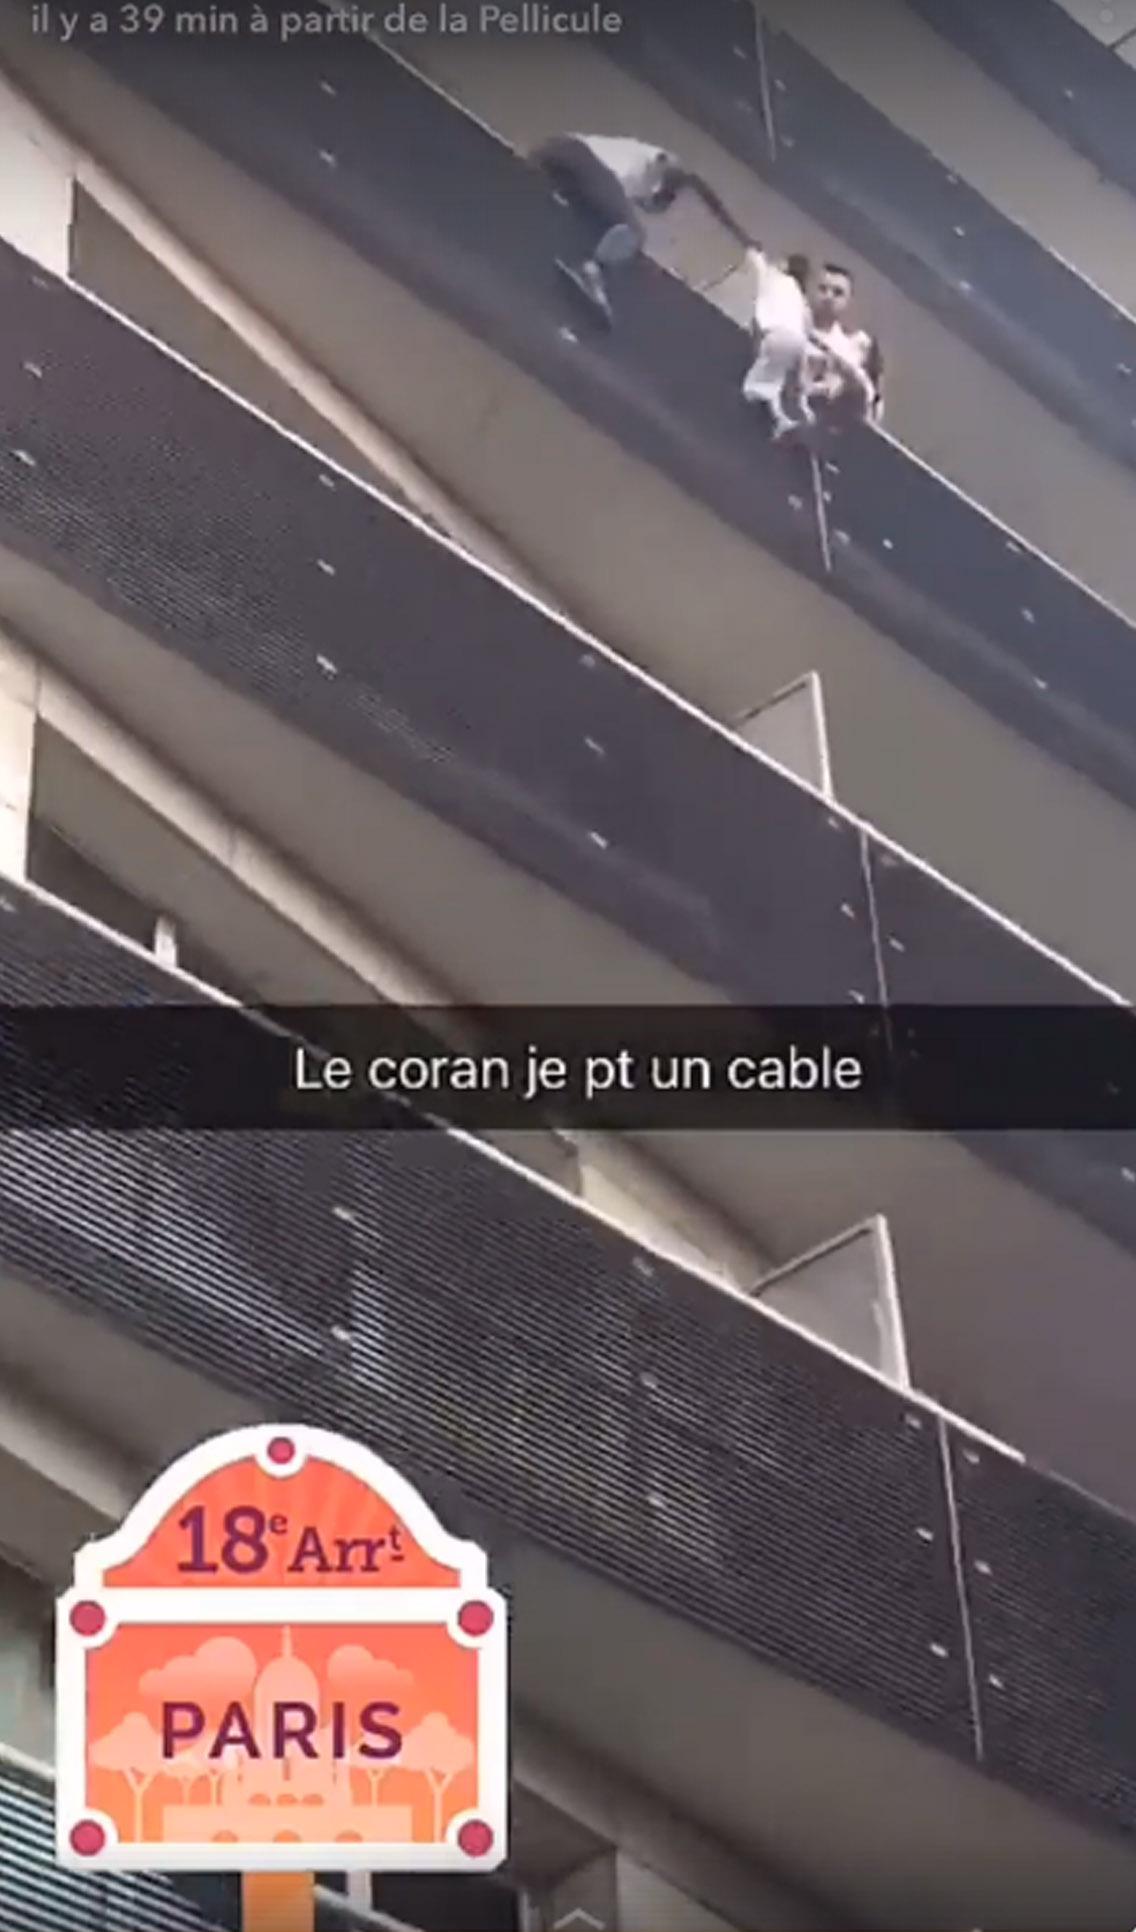 imigrante prédio resgate menino